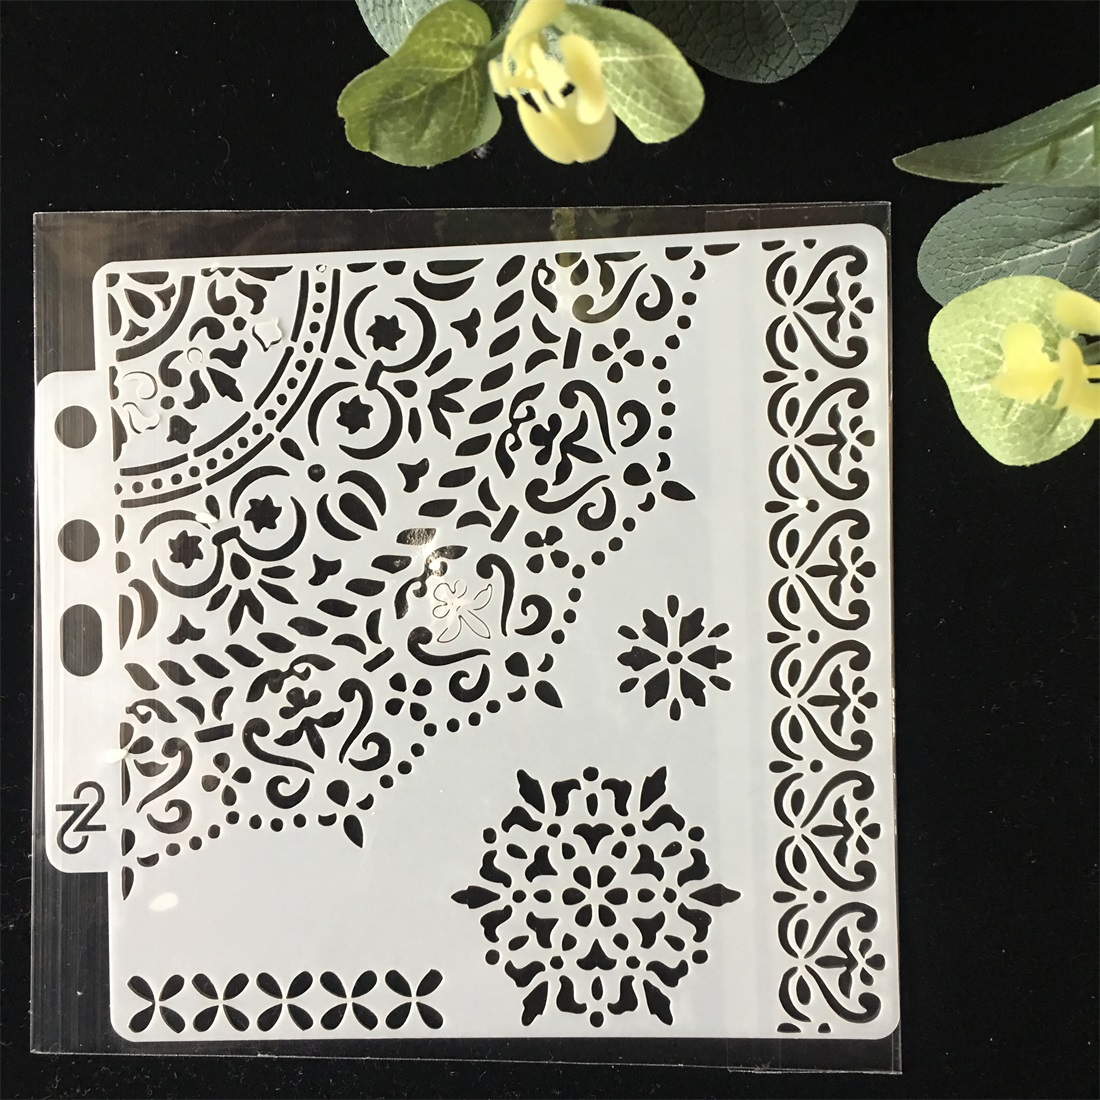 1Pcs  1/4 Circle Edge DIY Layering Stencils Wall Painting Scrapbook Coloring Embossing Album Decorative Paper Card Template